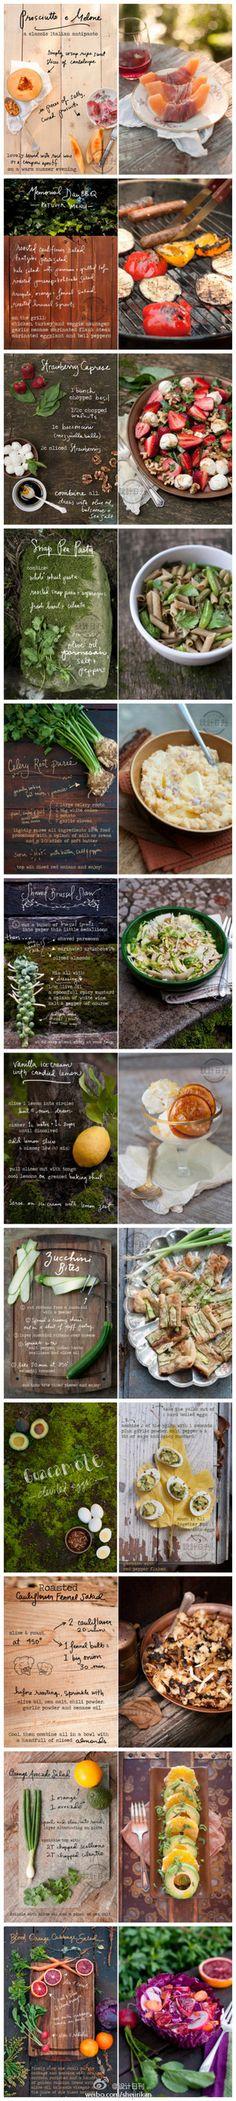 Erin Gleeson开设了一个叫 'The Forest Feast'的博客,她把美食照片作为背景图片,手写食谱于上。这些食谱的排版方式非常清新可人。( - 堆糖 发现生活_收集美好_分享图片